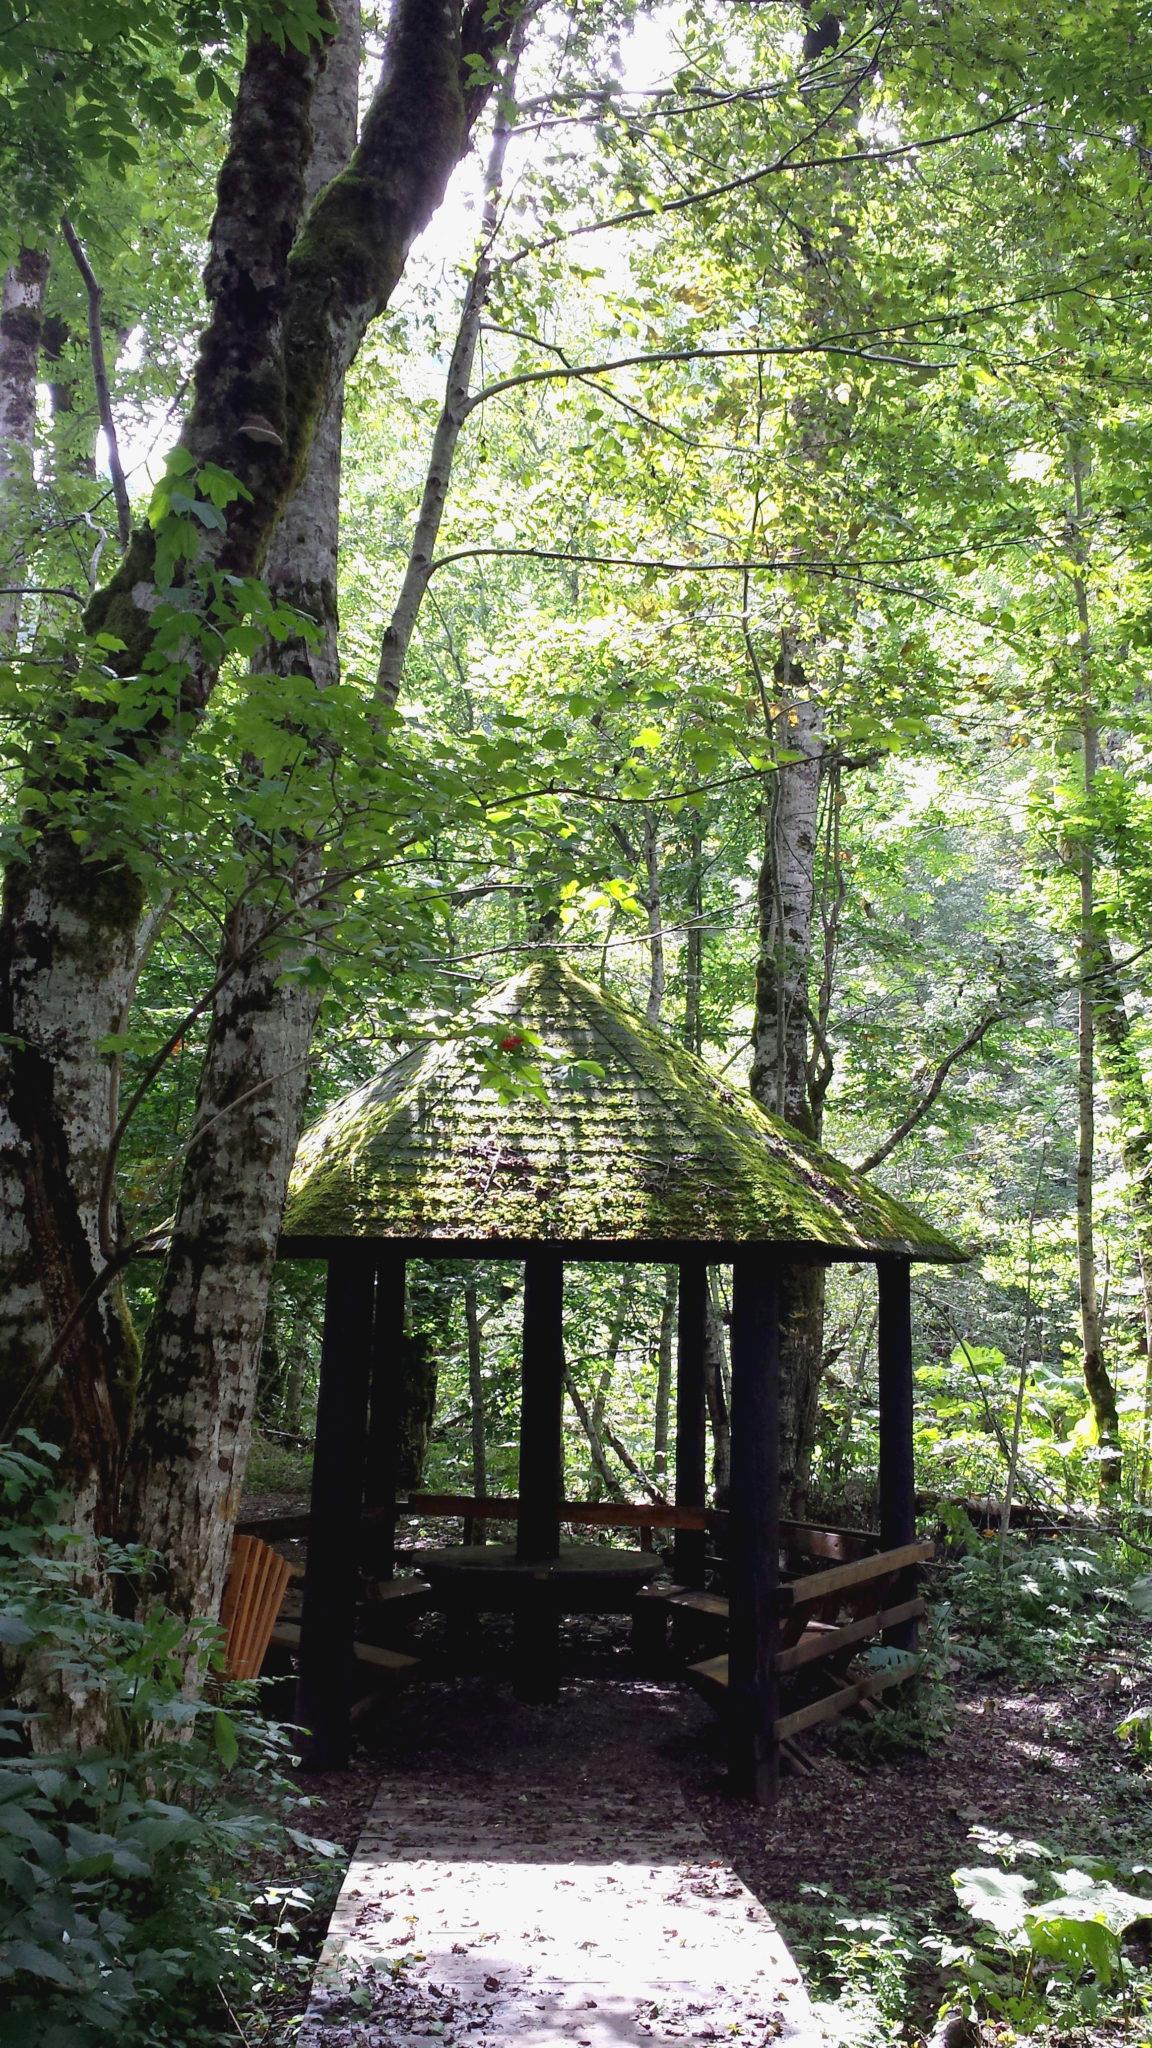 Hema_Montenegro_parc_national_biogradska_gora_forest_travel_voyage_blog15